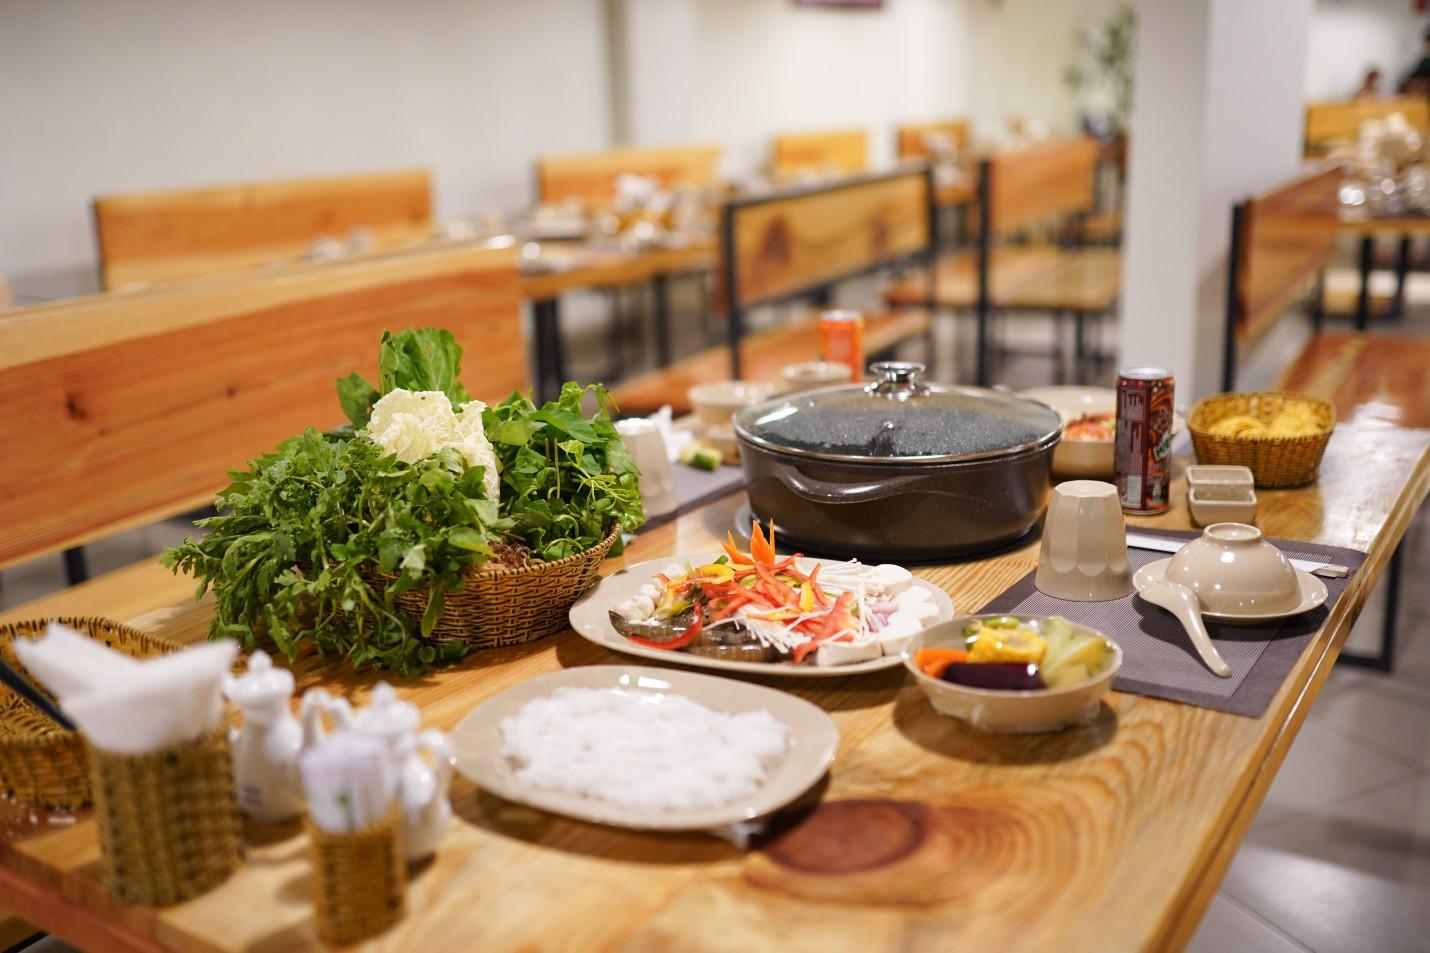 Ăn rau thả ga tại buffet rau Léguda Nha Trang - Ảnh 6.